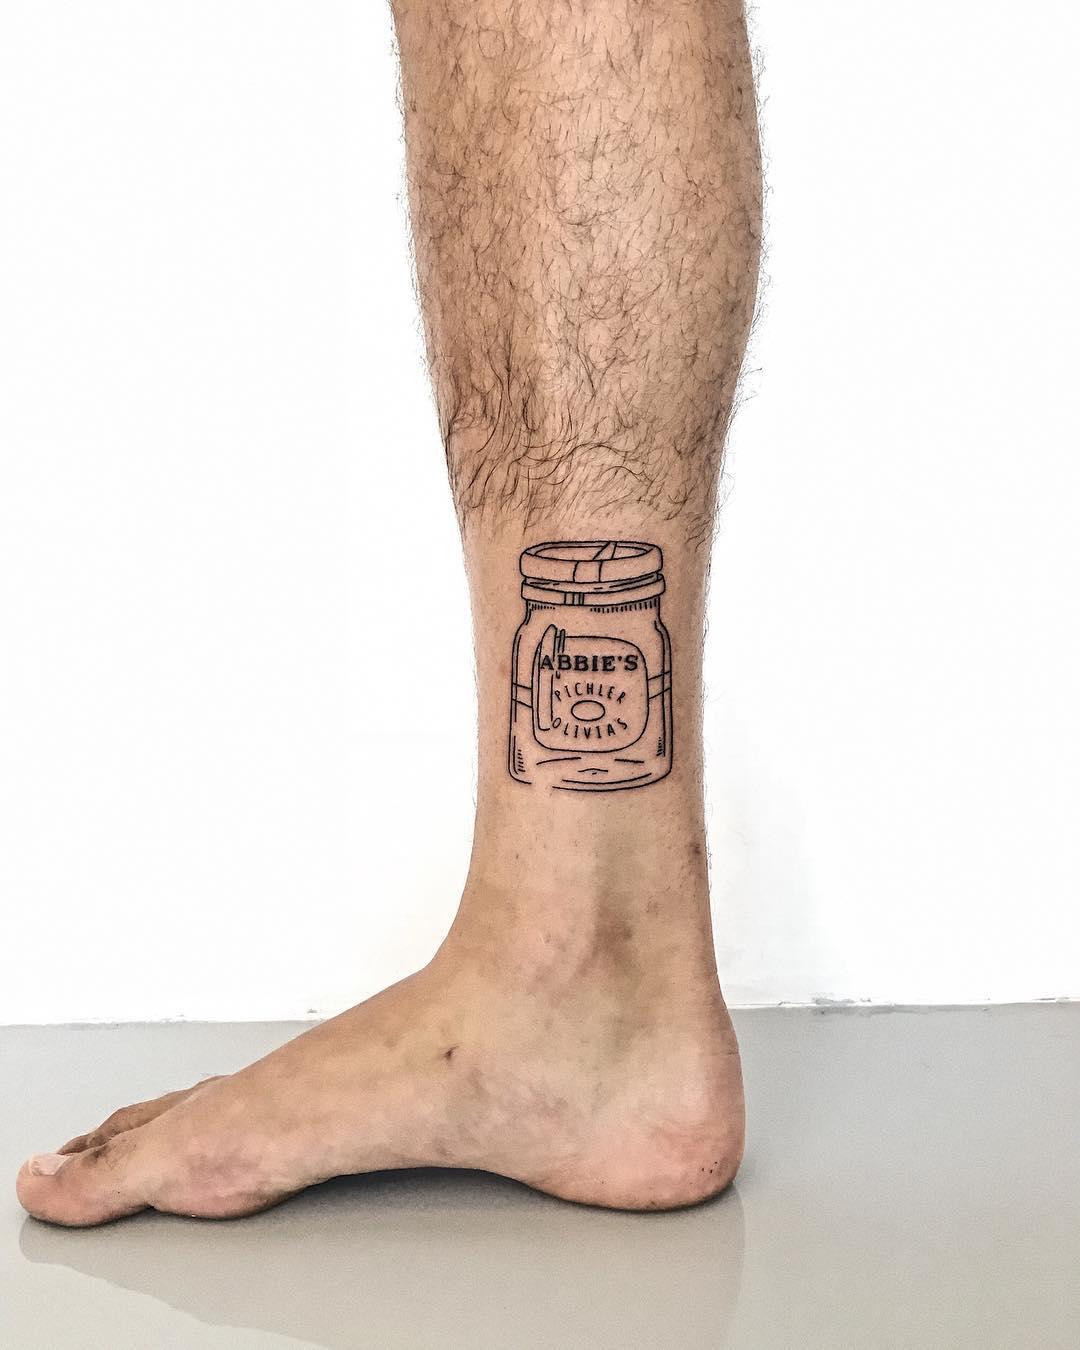 Pichler Olivias tattoo by Sasha But.maybe